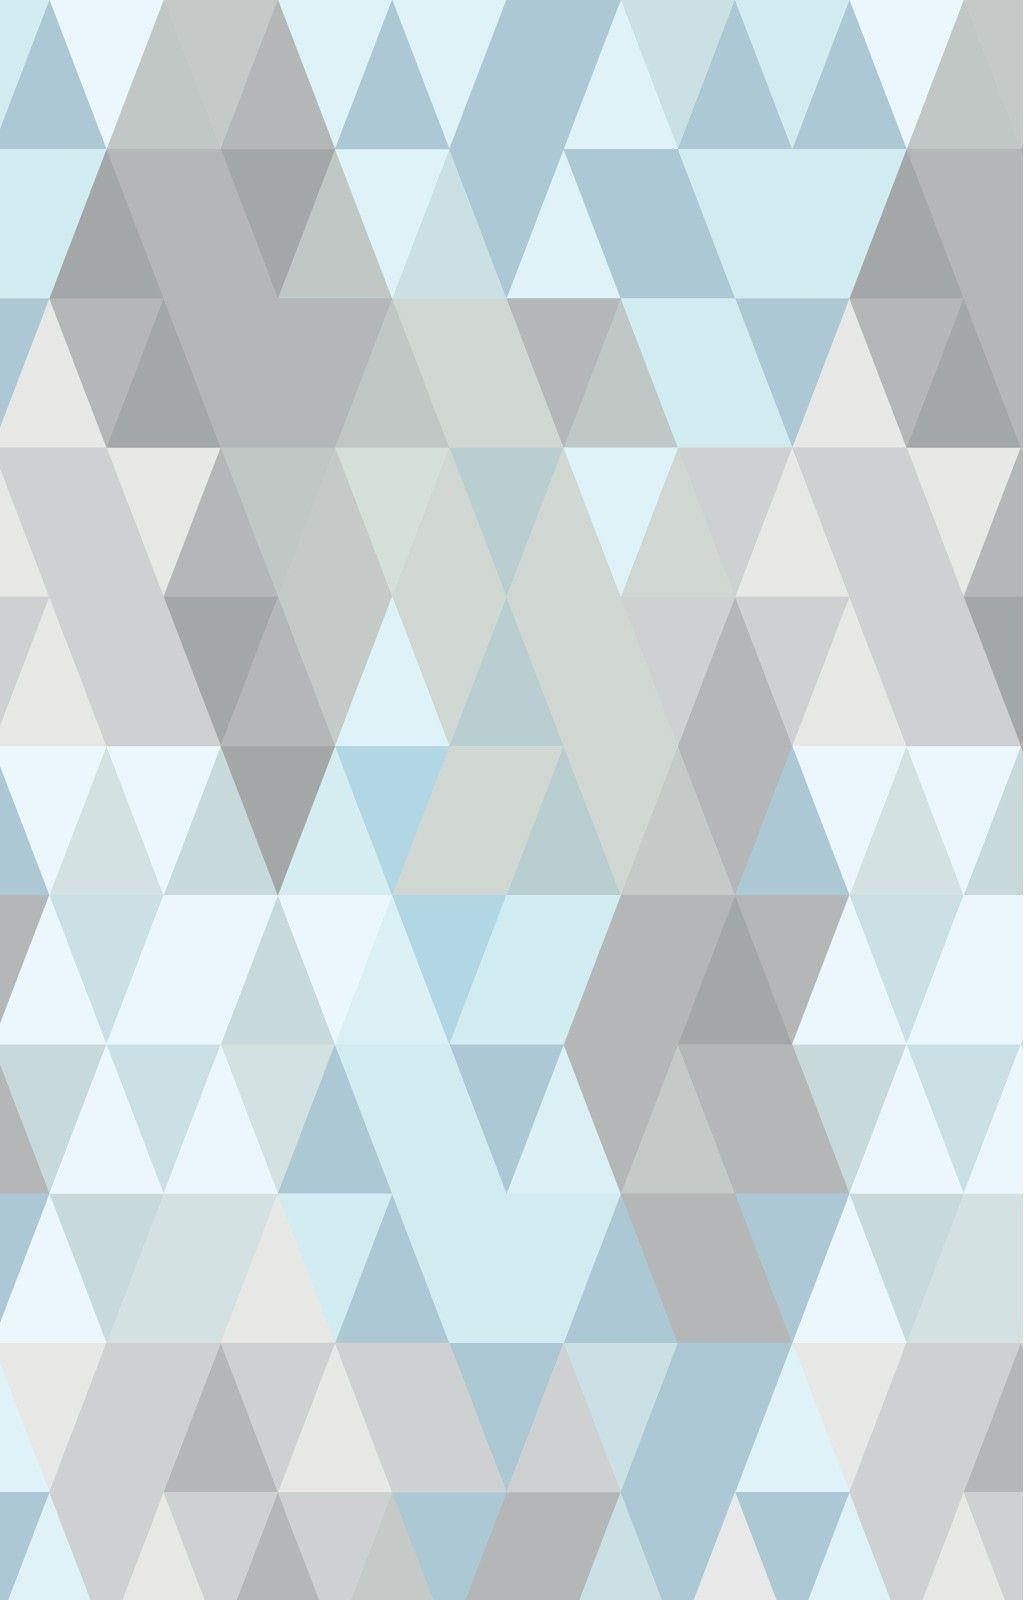 Papier Peint Hicks Hexagon Pas Cher paul : lé papiers de ninon | fondos de colores, diseños de fondo